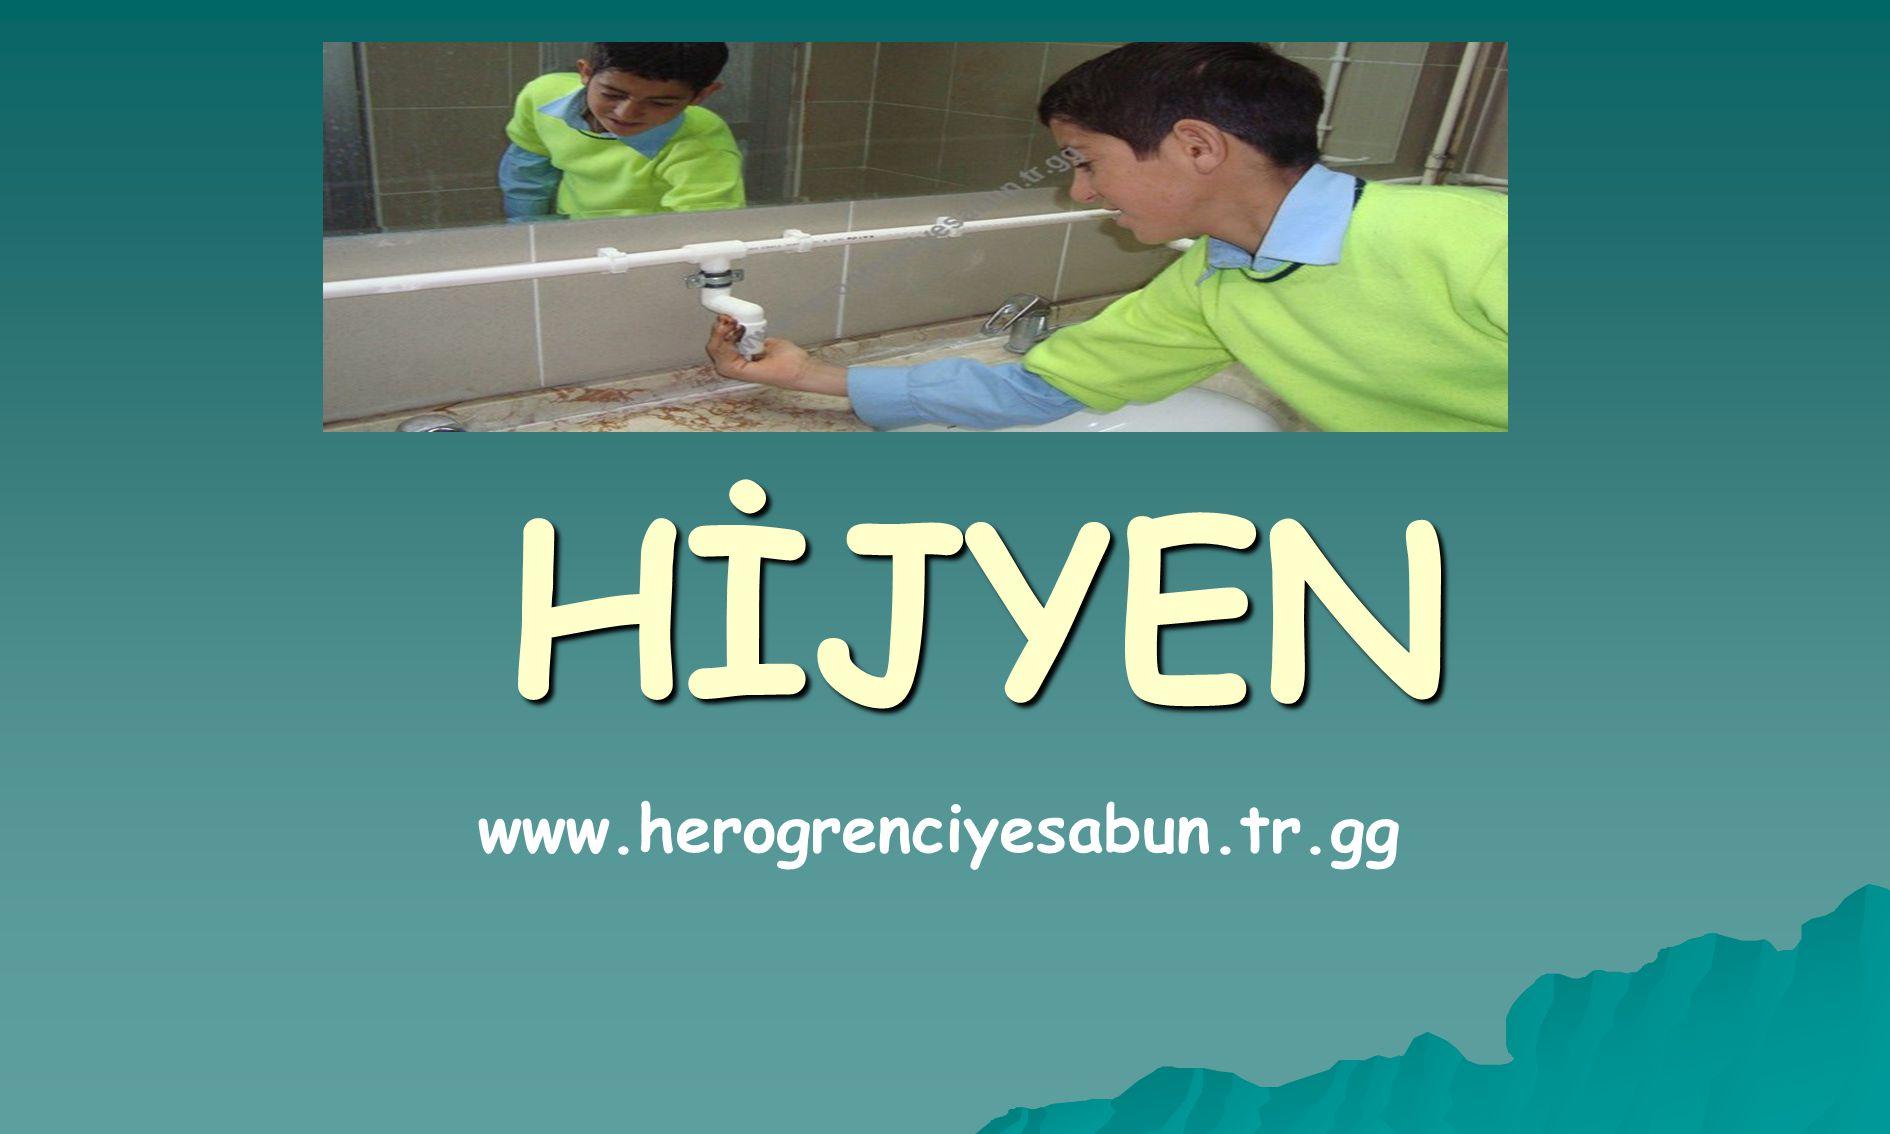 HİJYEN www.herogrenciyesabun.tr.gg